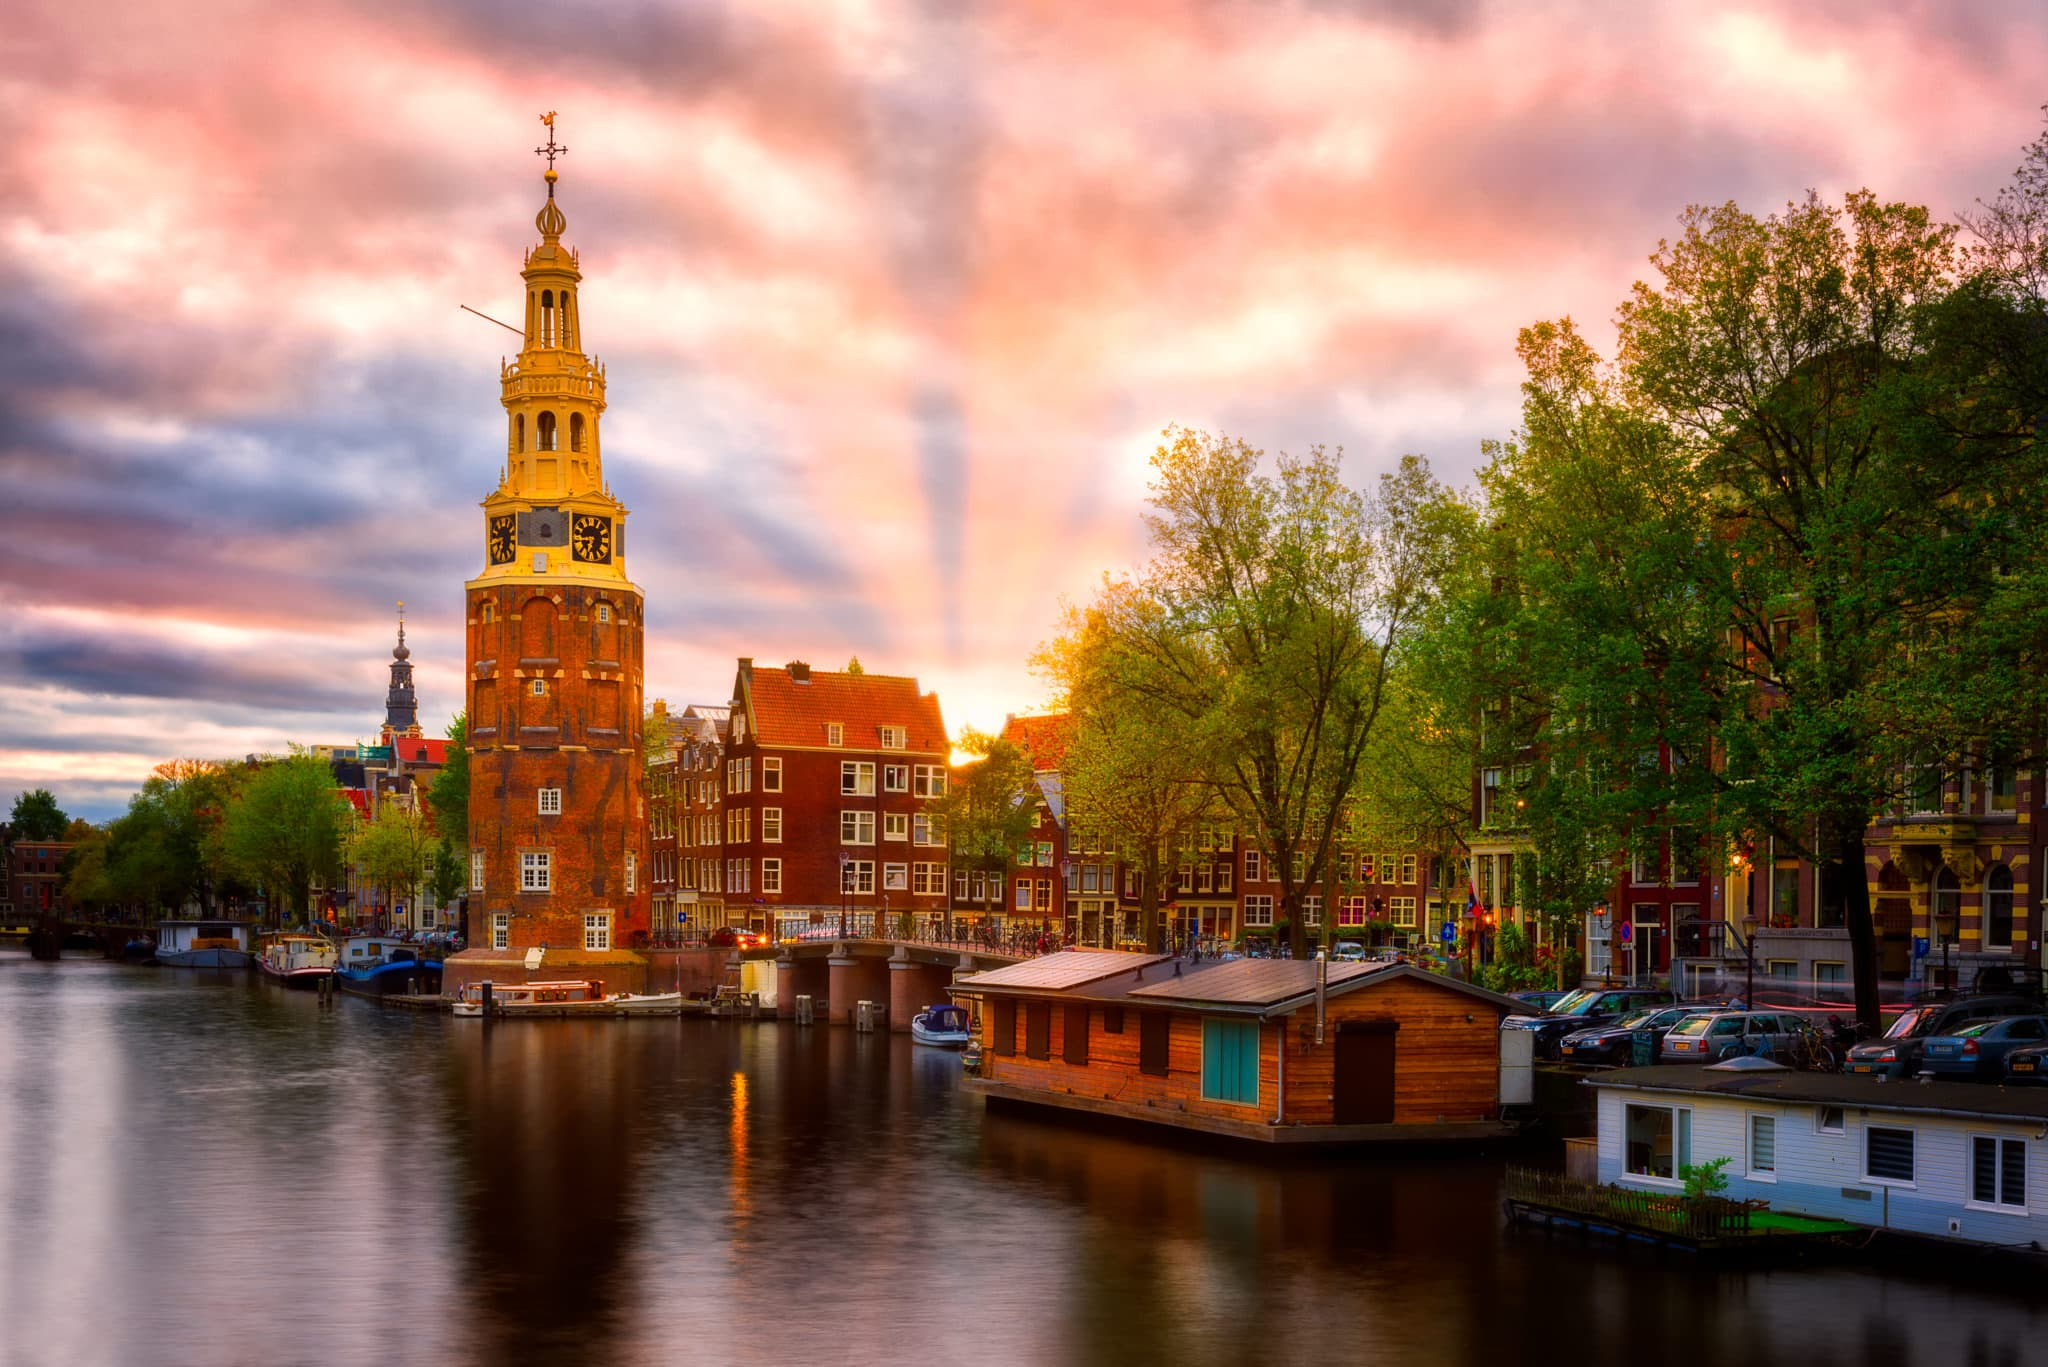 Montelbaanstoren | Amsterdam, Holandia